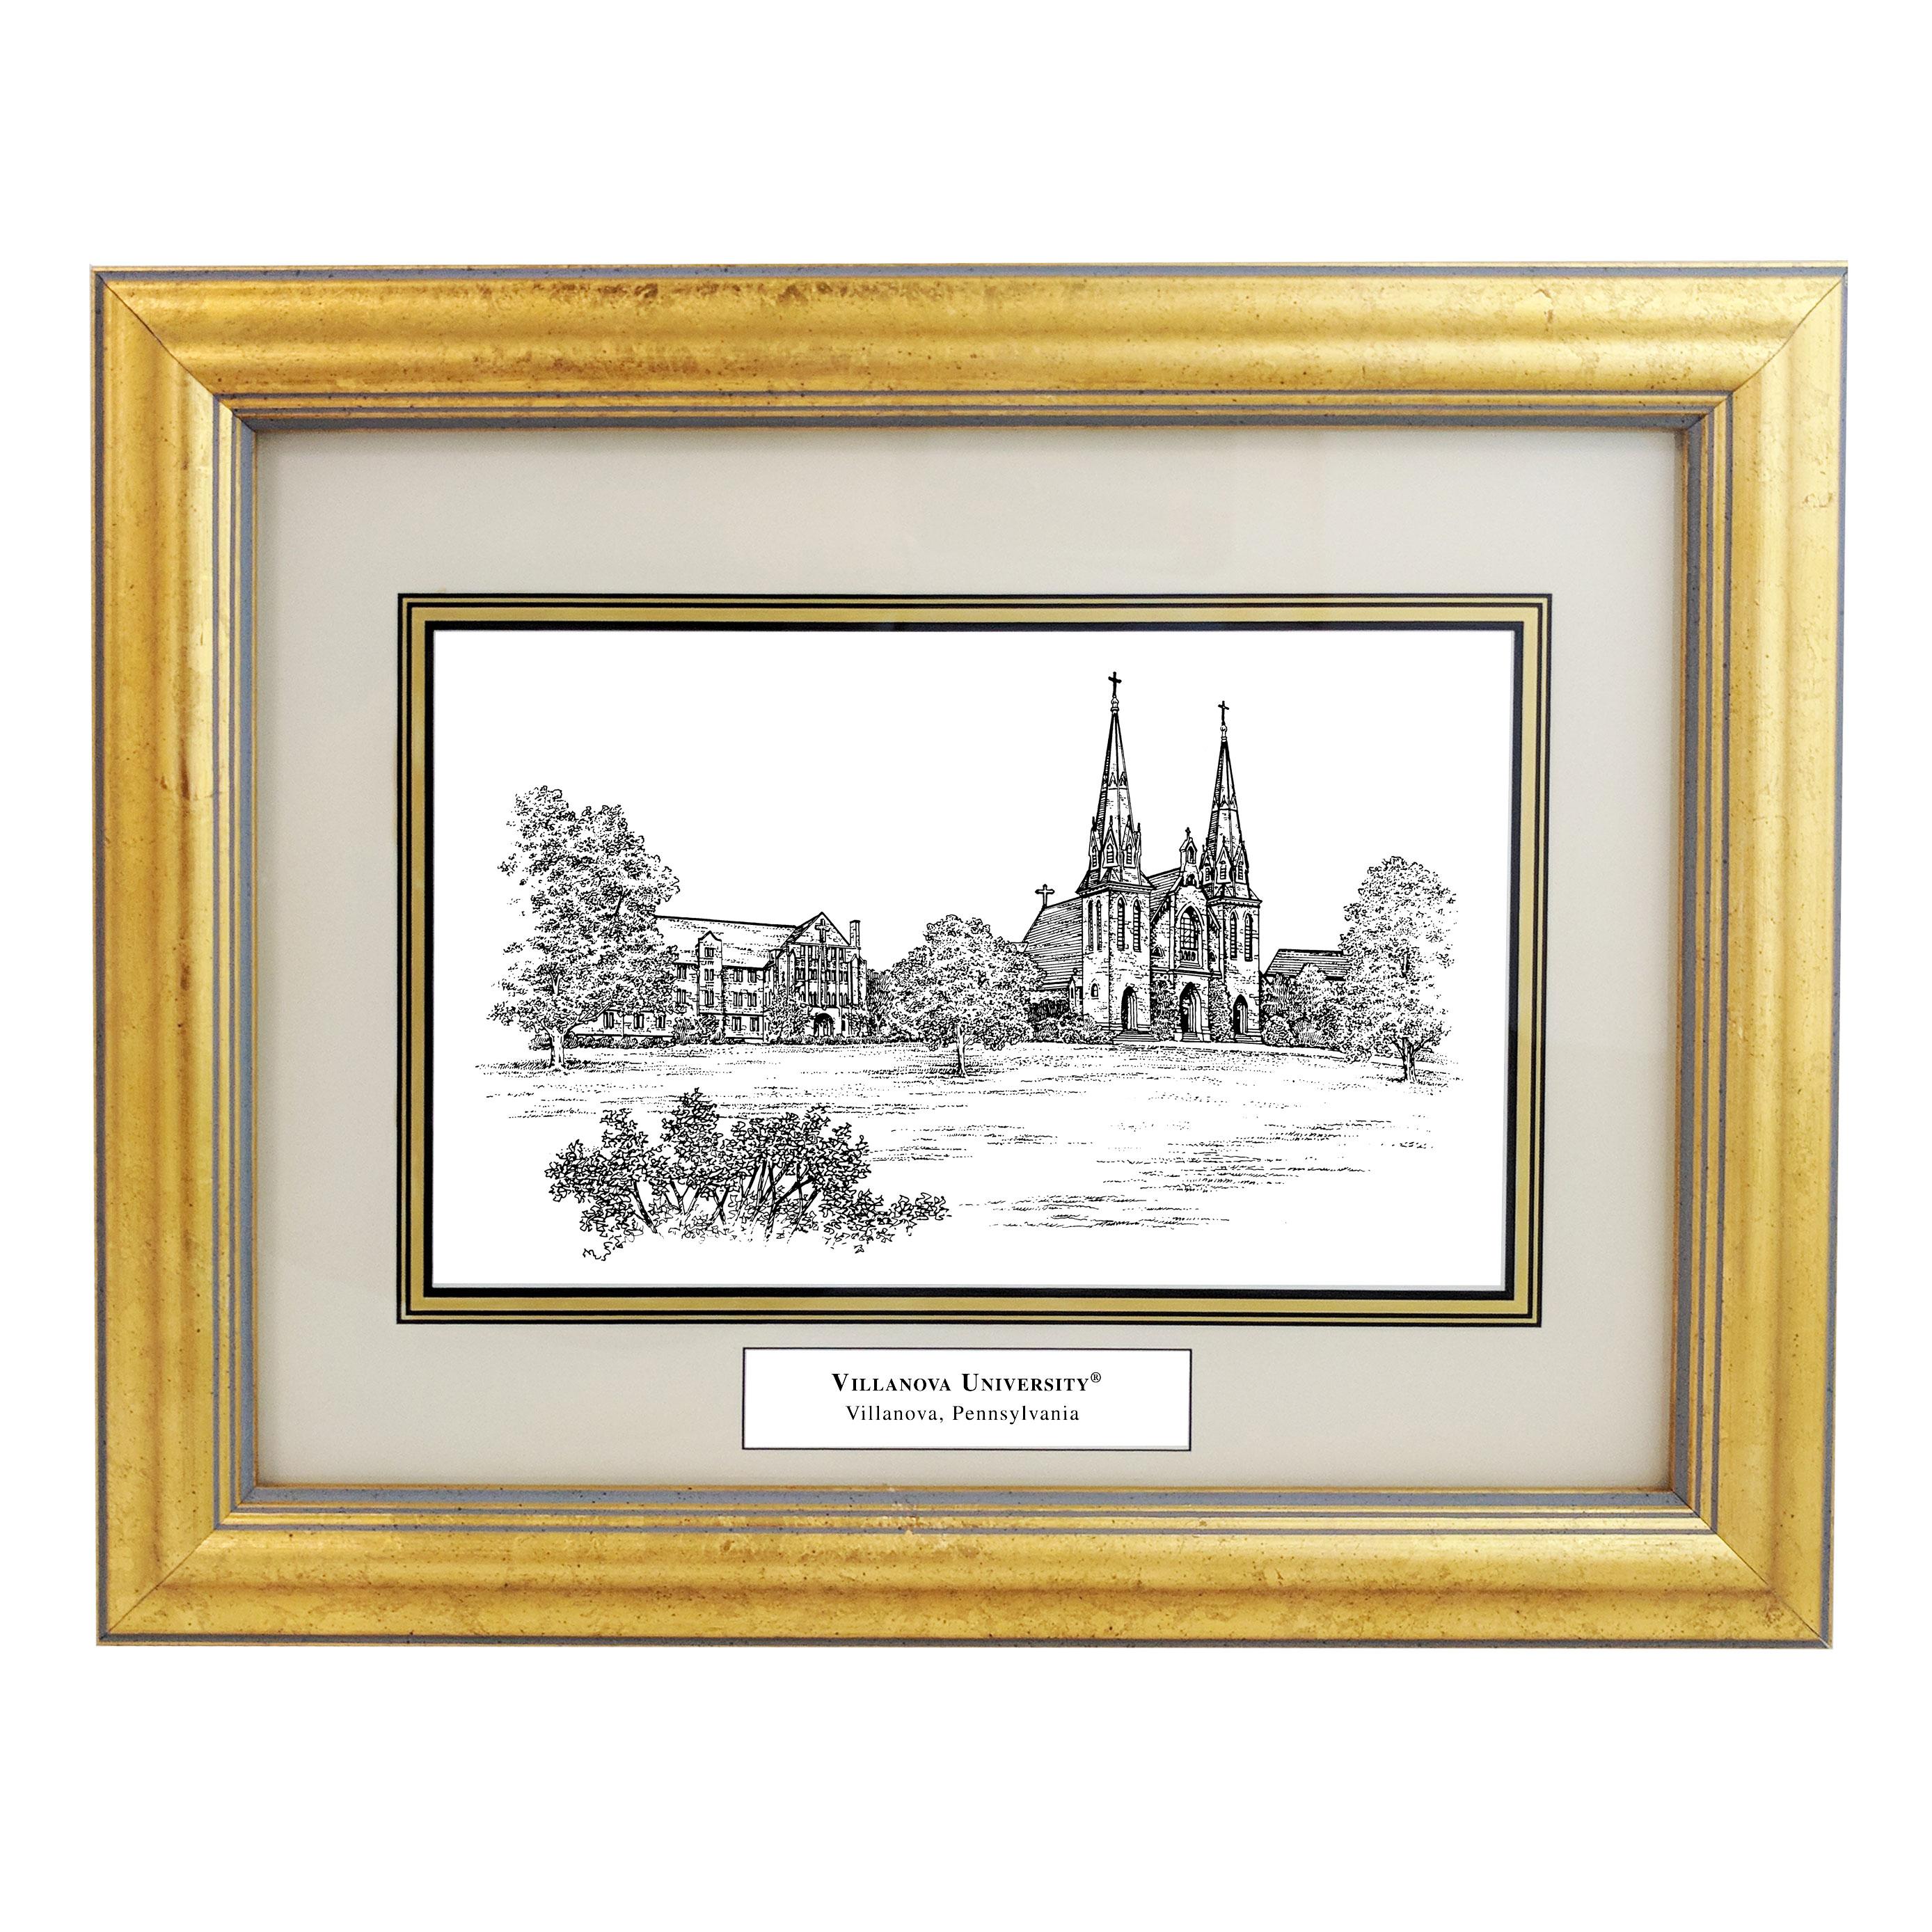 Framed Pen and Ink Villanova University Print